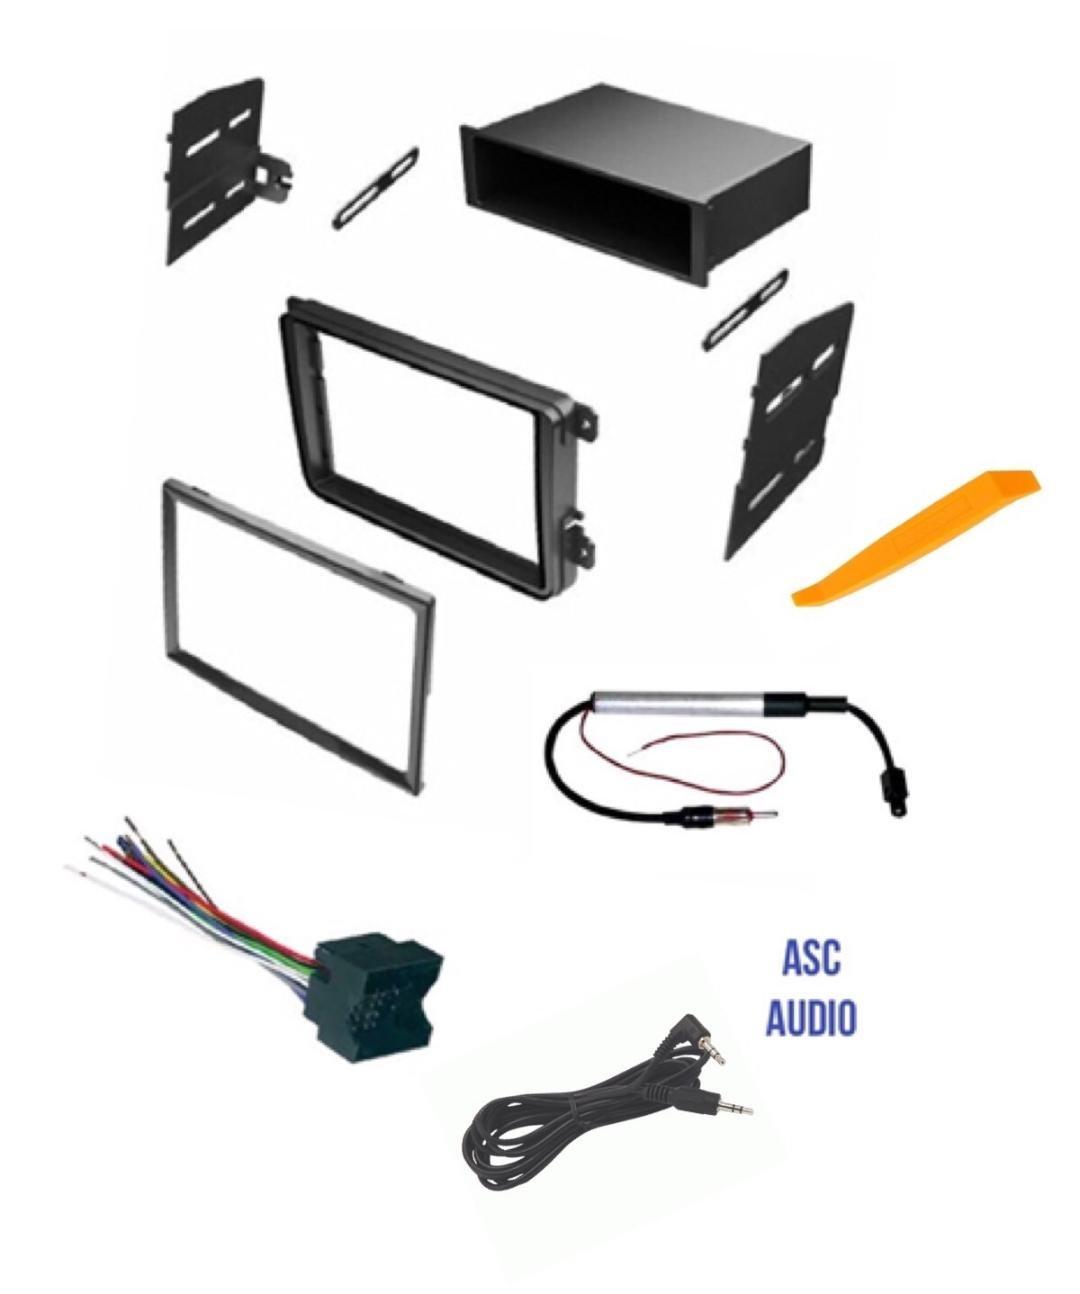 ASC Car Stereo Radio Dash Kit, Wire Harness, and Antenna Adapter for VW Volkswagen: 2012-2015 Beetle, 09-14 CC, 07-14 Eos, 10-14 Golf, 06-14 GTI, 06-15 Jetta, 06-14 Passat, 06-09 Rabbit, 09-14 Tiguan